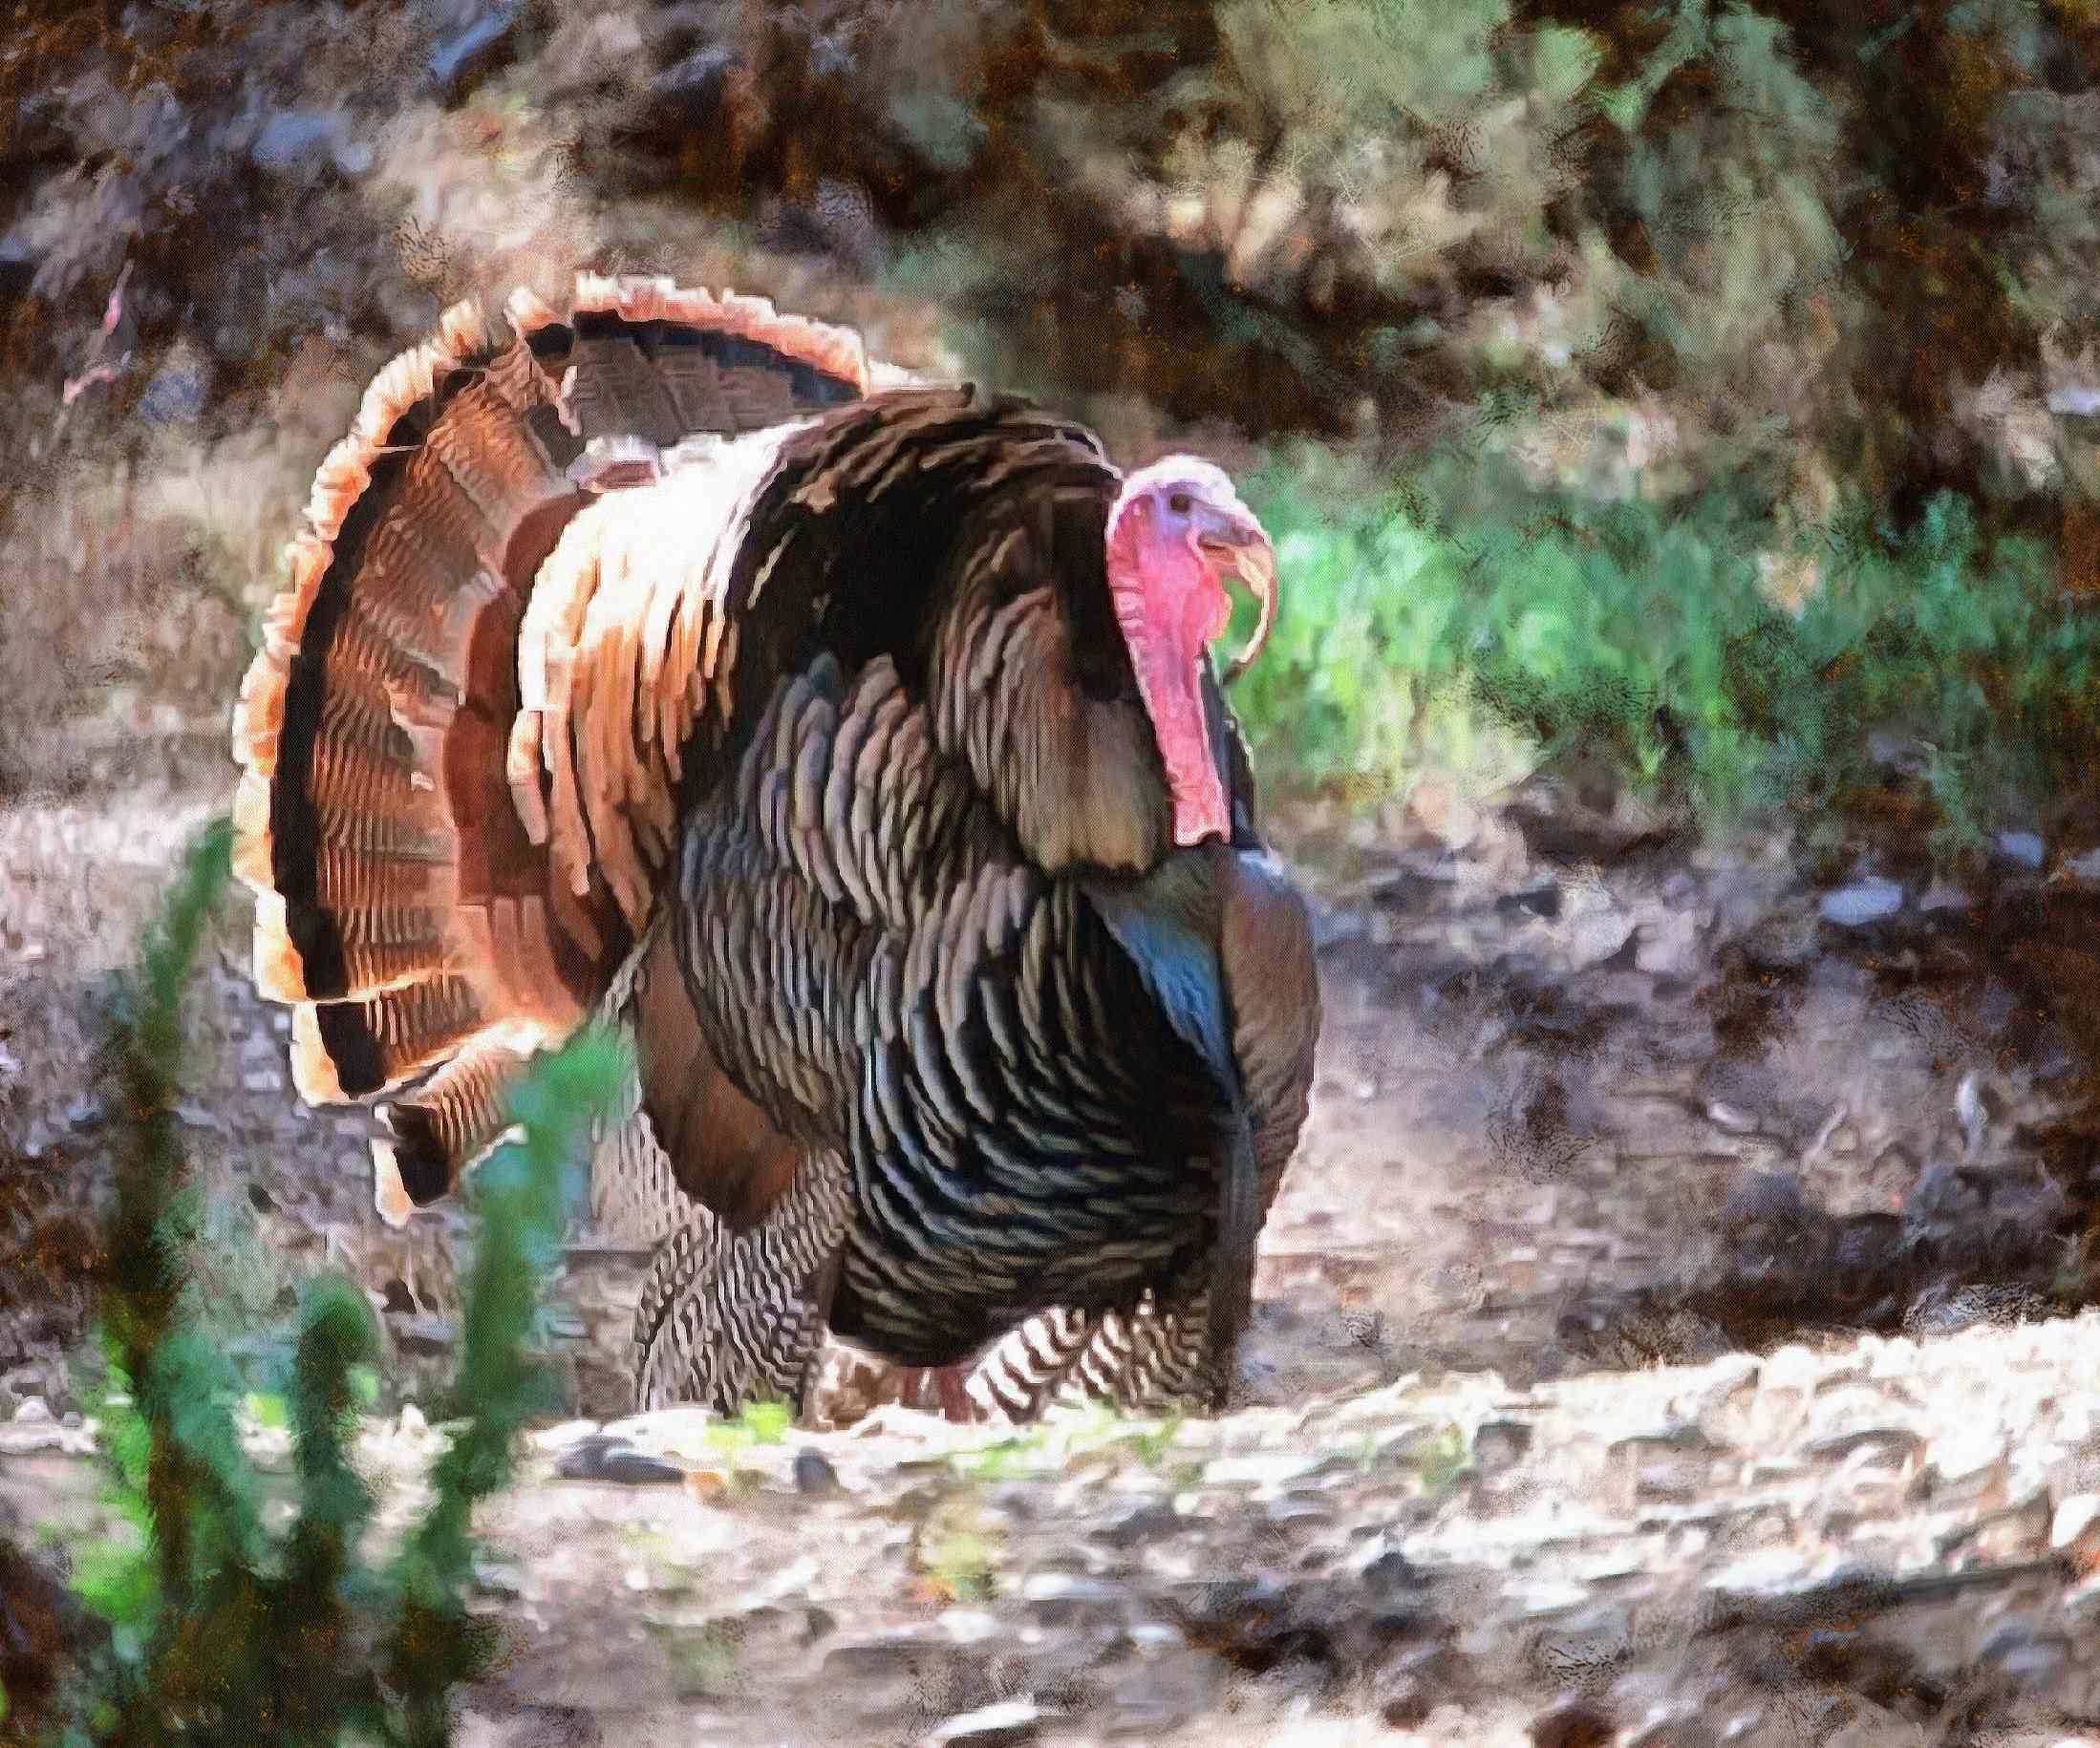 white turkey, live turkey, bird, holiday, thanksgiving, turkey, Thanksgiving Day,   - thanksgiving, stock free image, public domain photos, free stock photo, download public domain images.